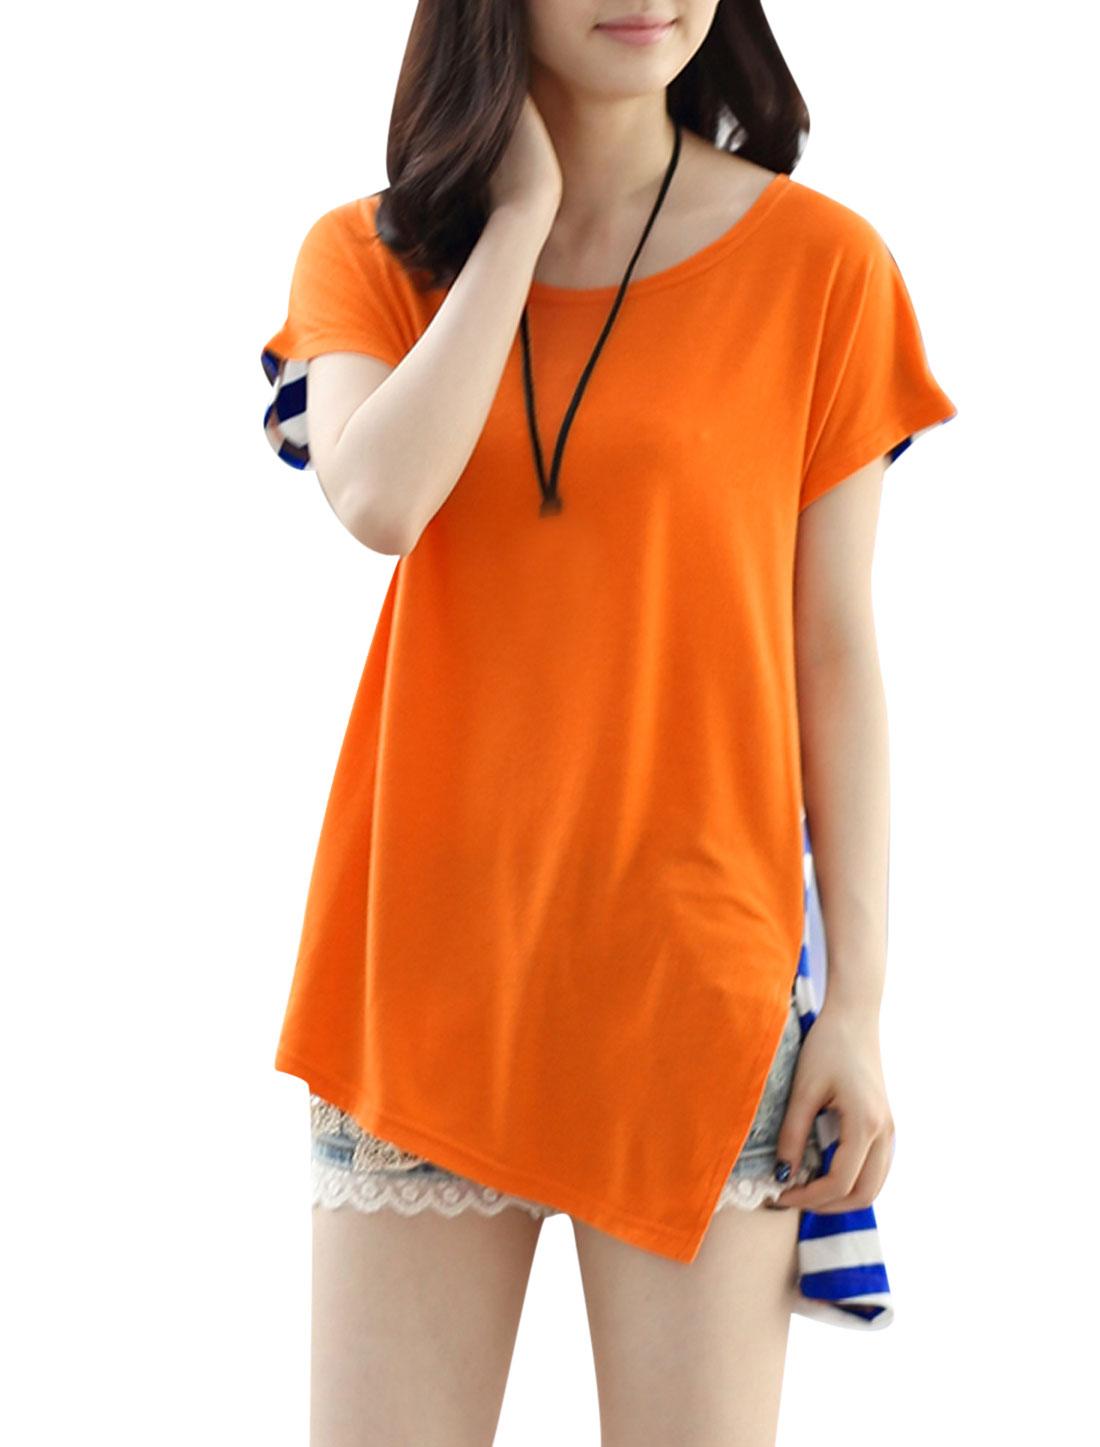 Lady Stripes Back Colorblock Irregular Hem Loose Tunic Tee Orange Blue XS